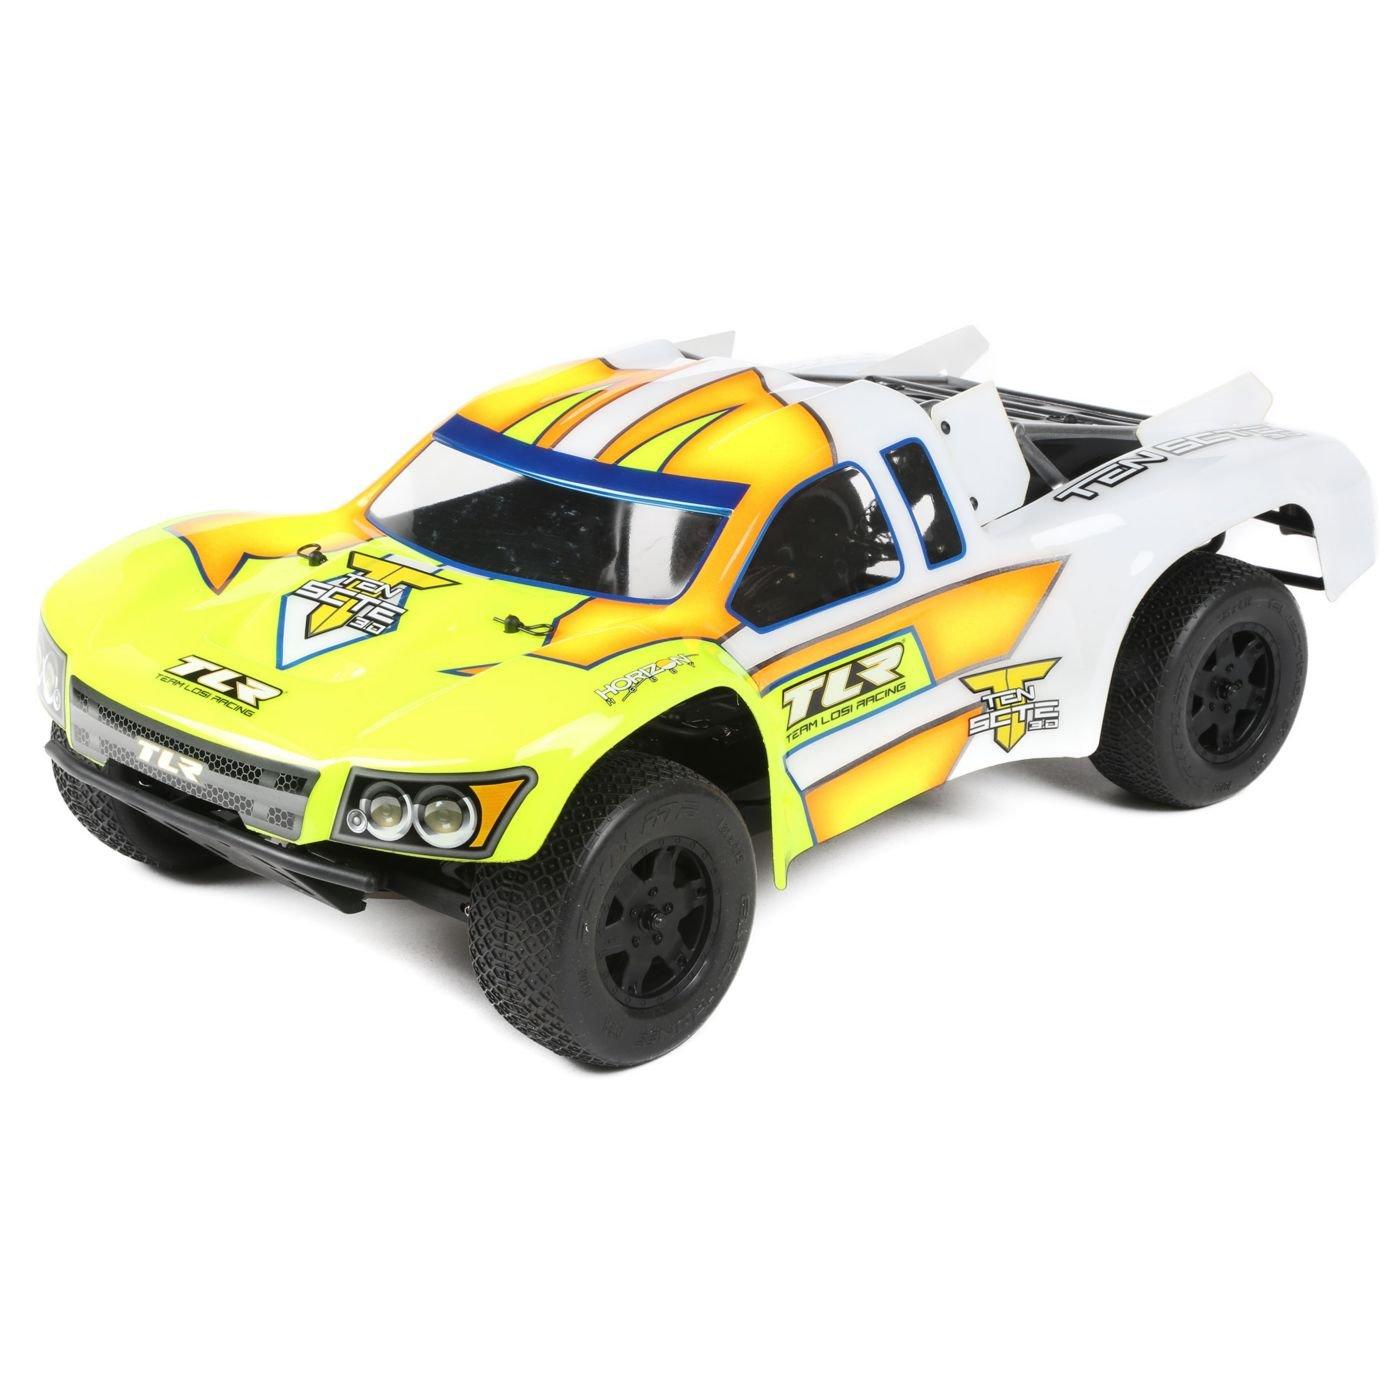 Team Losi Racing 1/10 Ten-SCTE 3.0 4WD SCT Race Kit, TLR03008 by Team Losi Racing